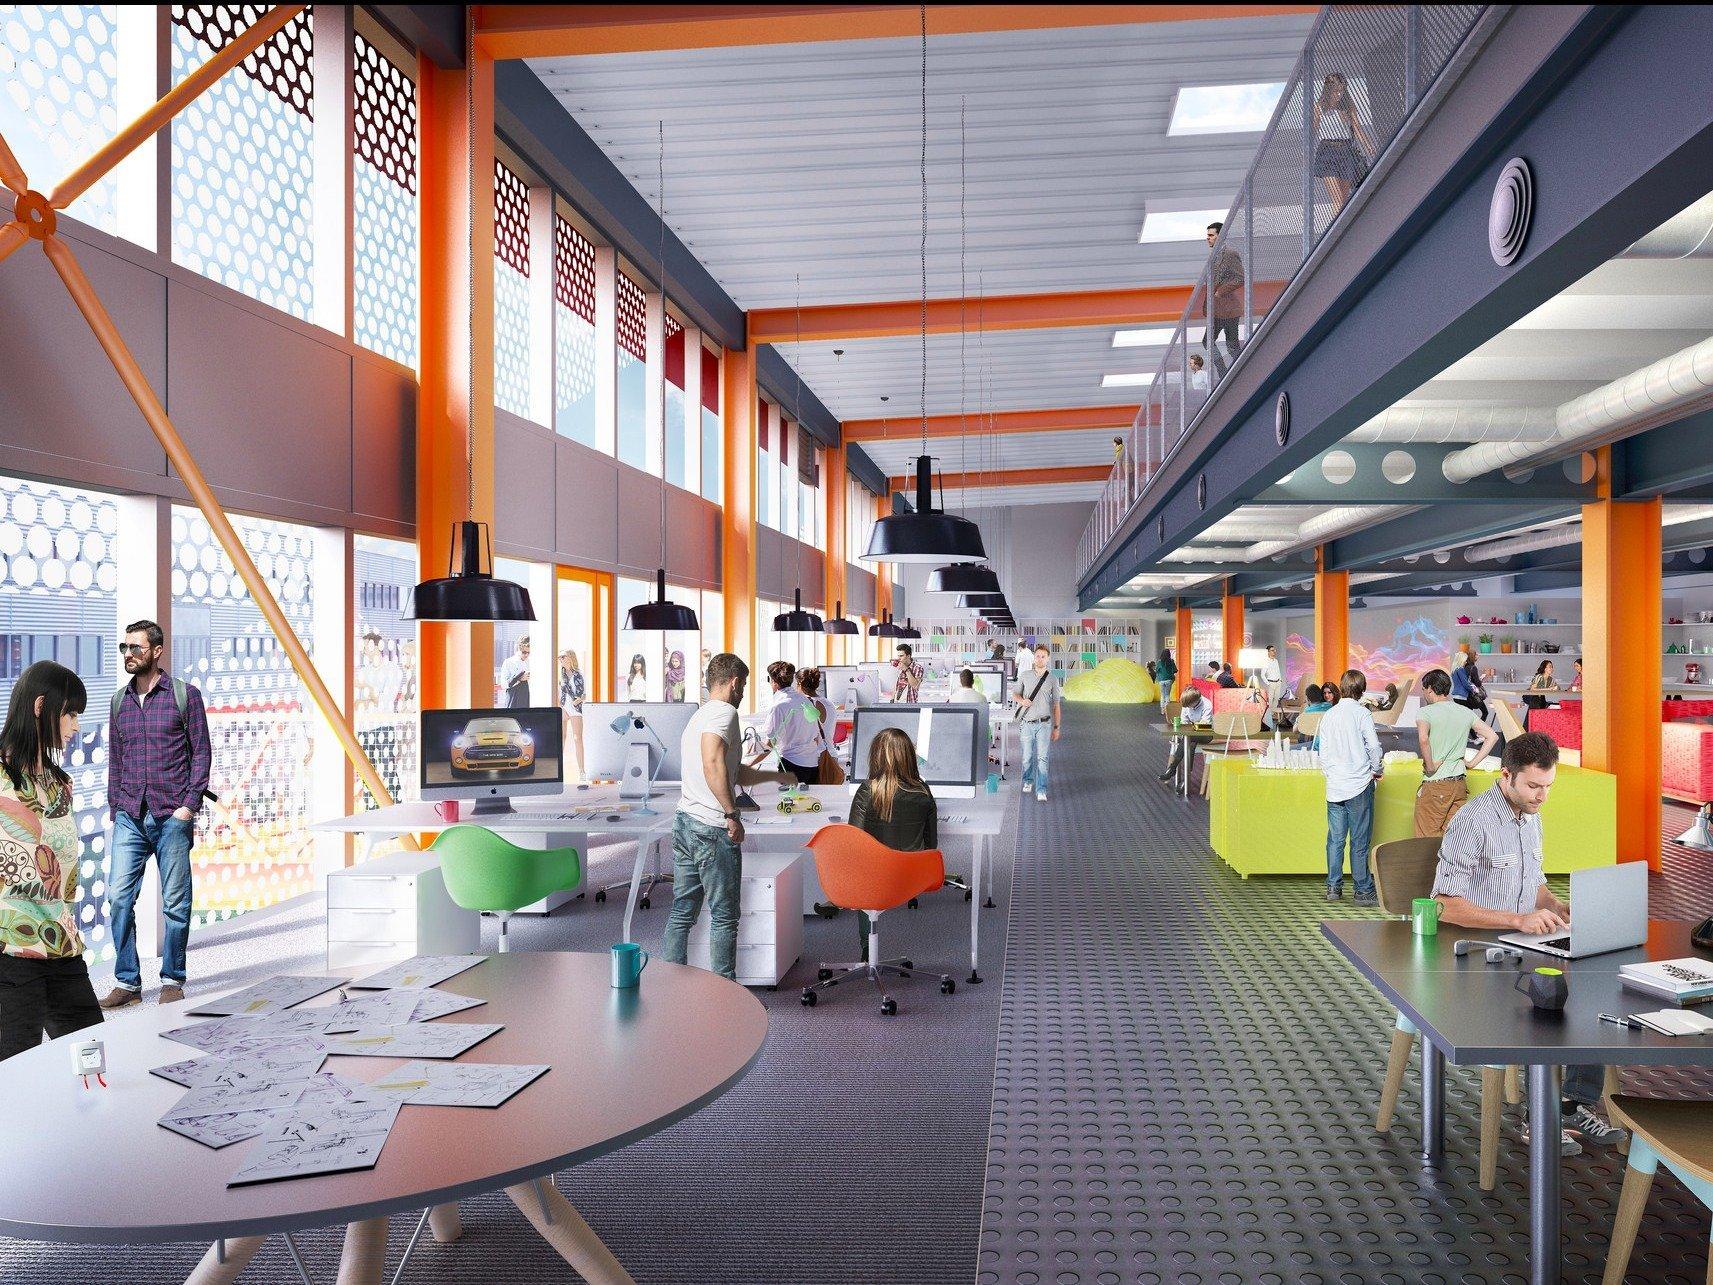 teknoloji inovasyon merkezi londra 5